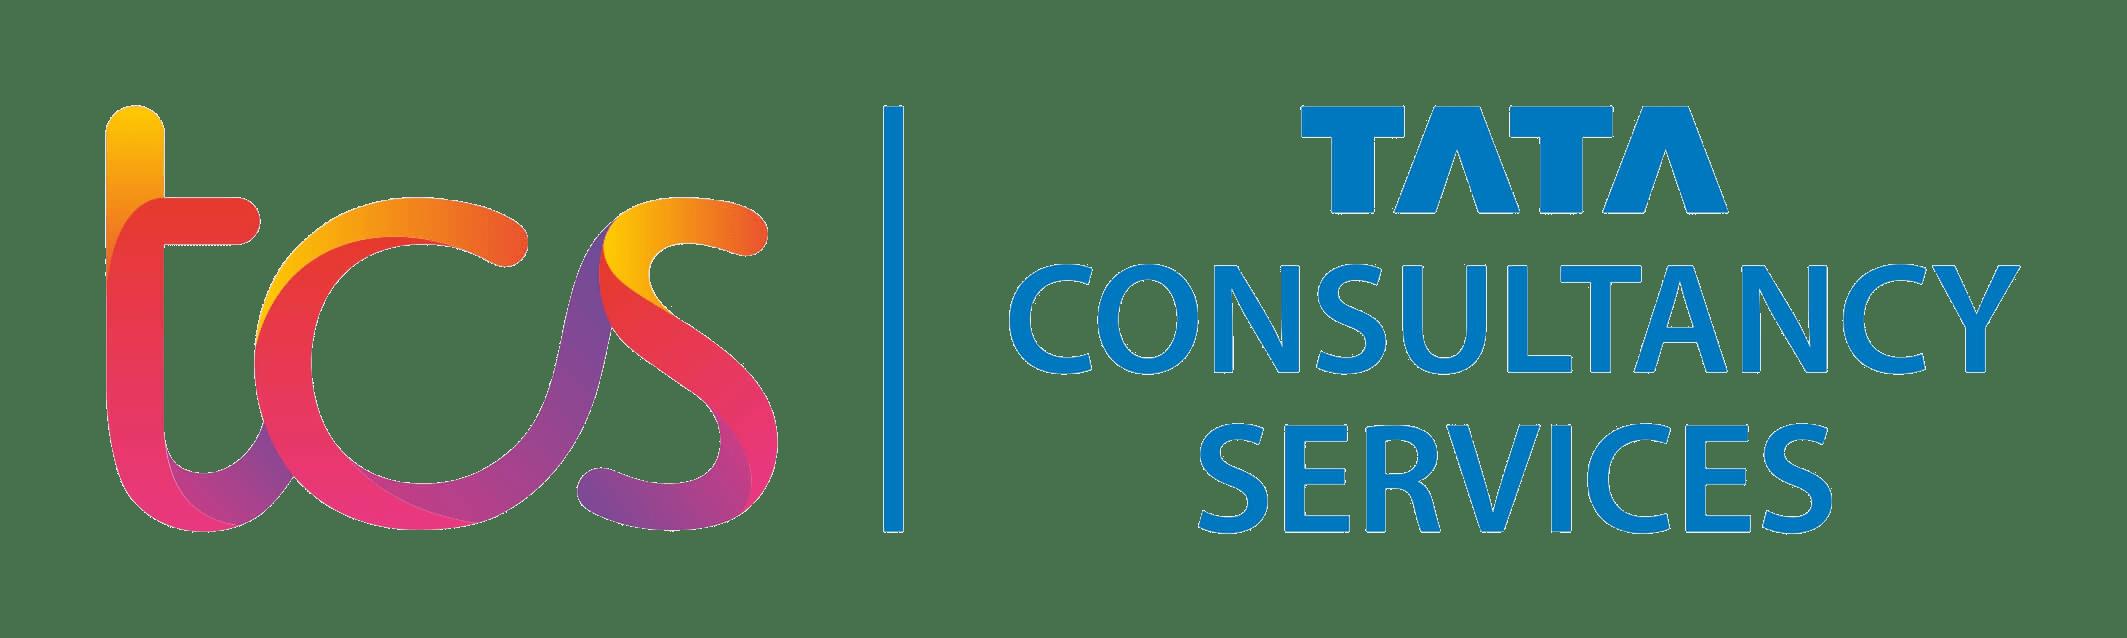 TCS-logo-new